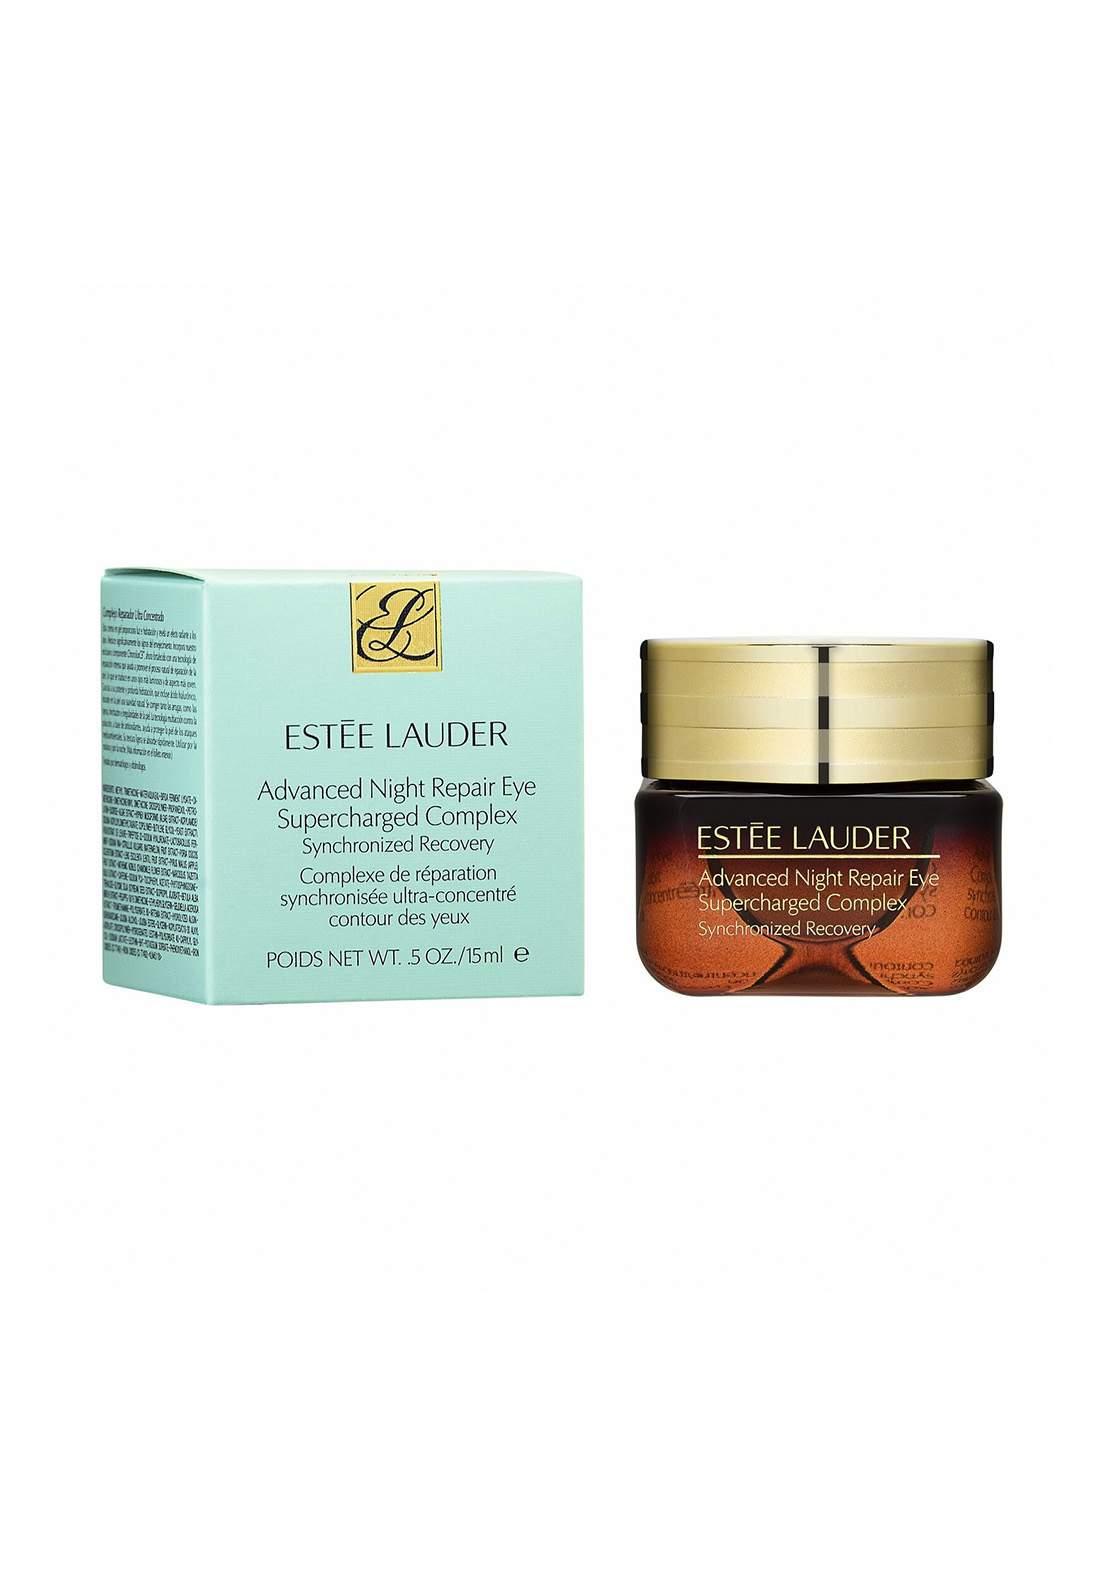 Estee Lauder Advanced Night Repair Eye Supercharged Complex 15ml Skincare كريم العين